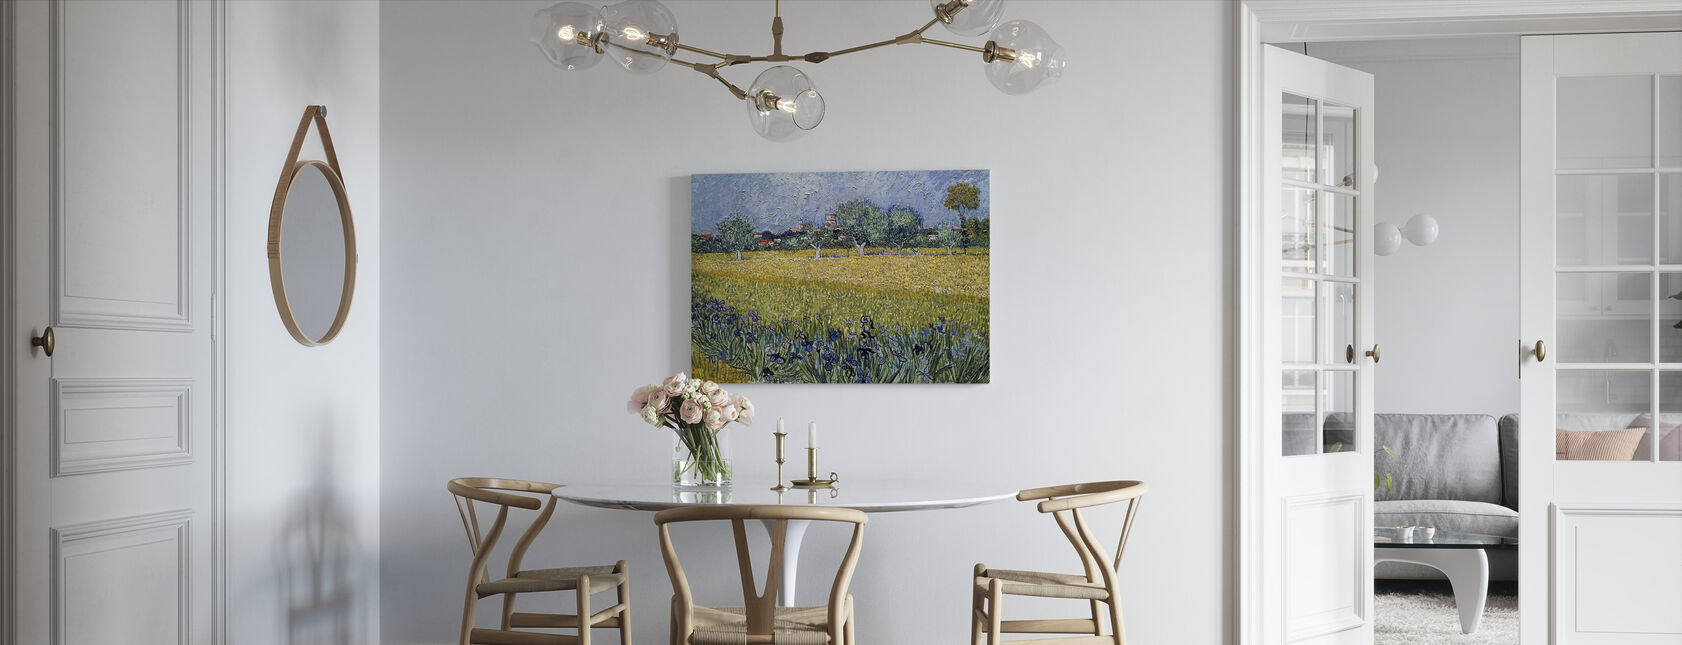 View of Arles with Irises - Vincent van Gogh - Canvas print - Kitchen